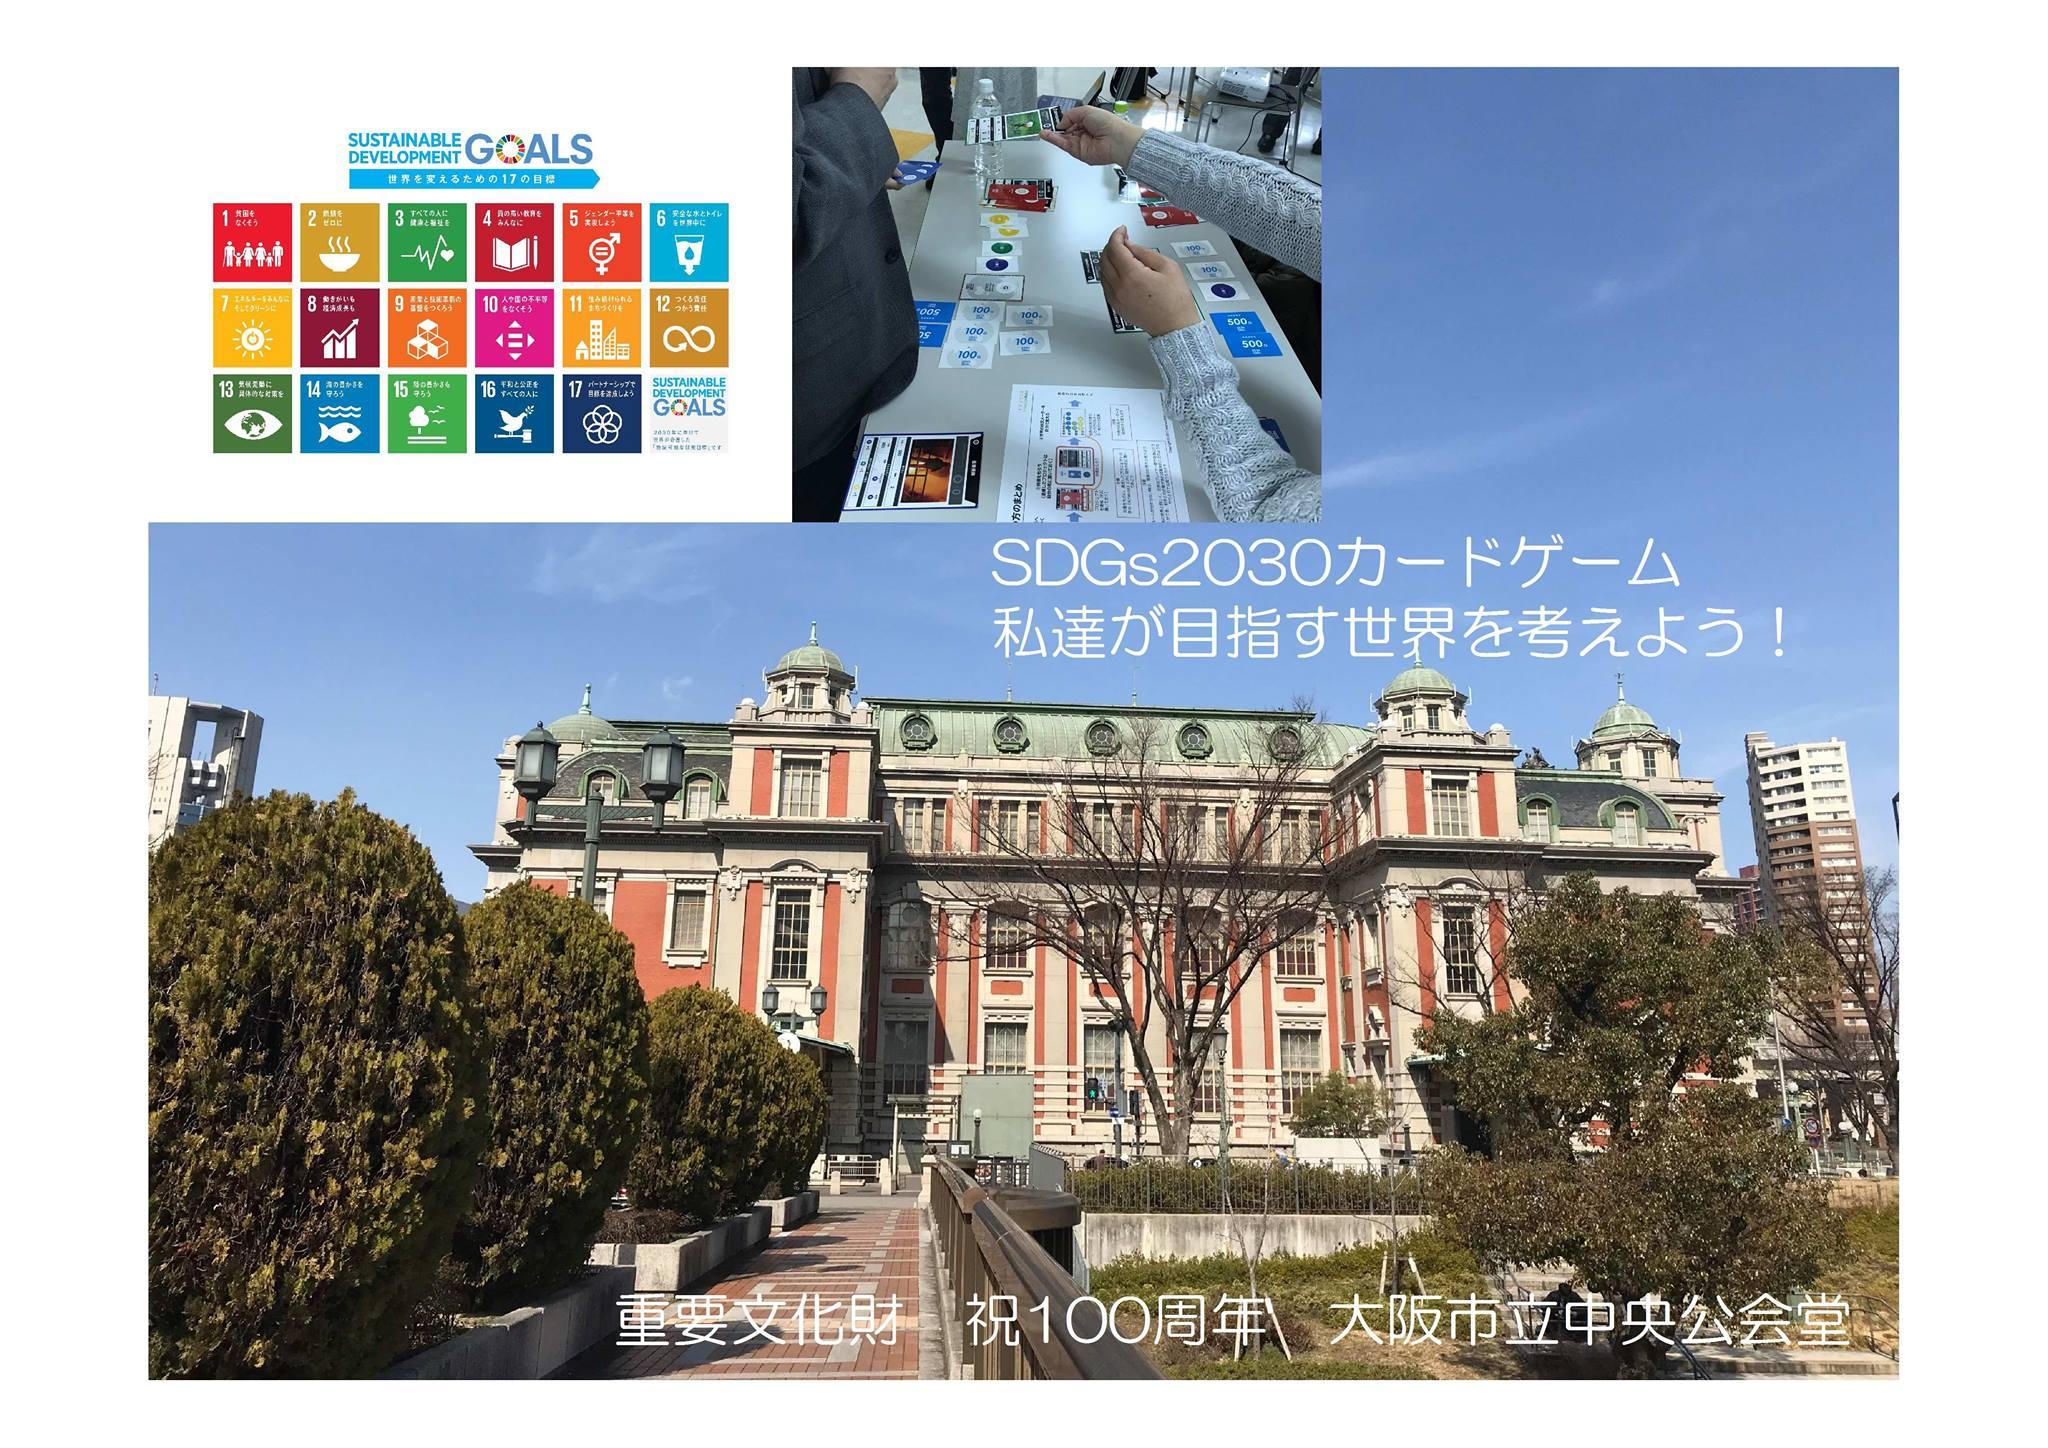 SDGsカードゲームで、私たちの目指す未来を考えよう!